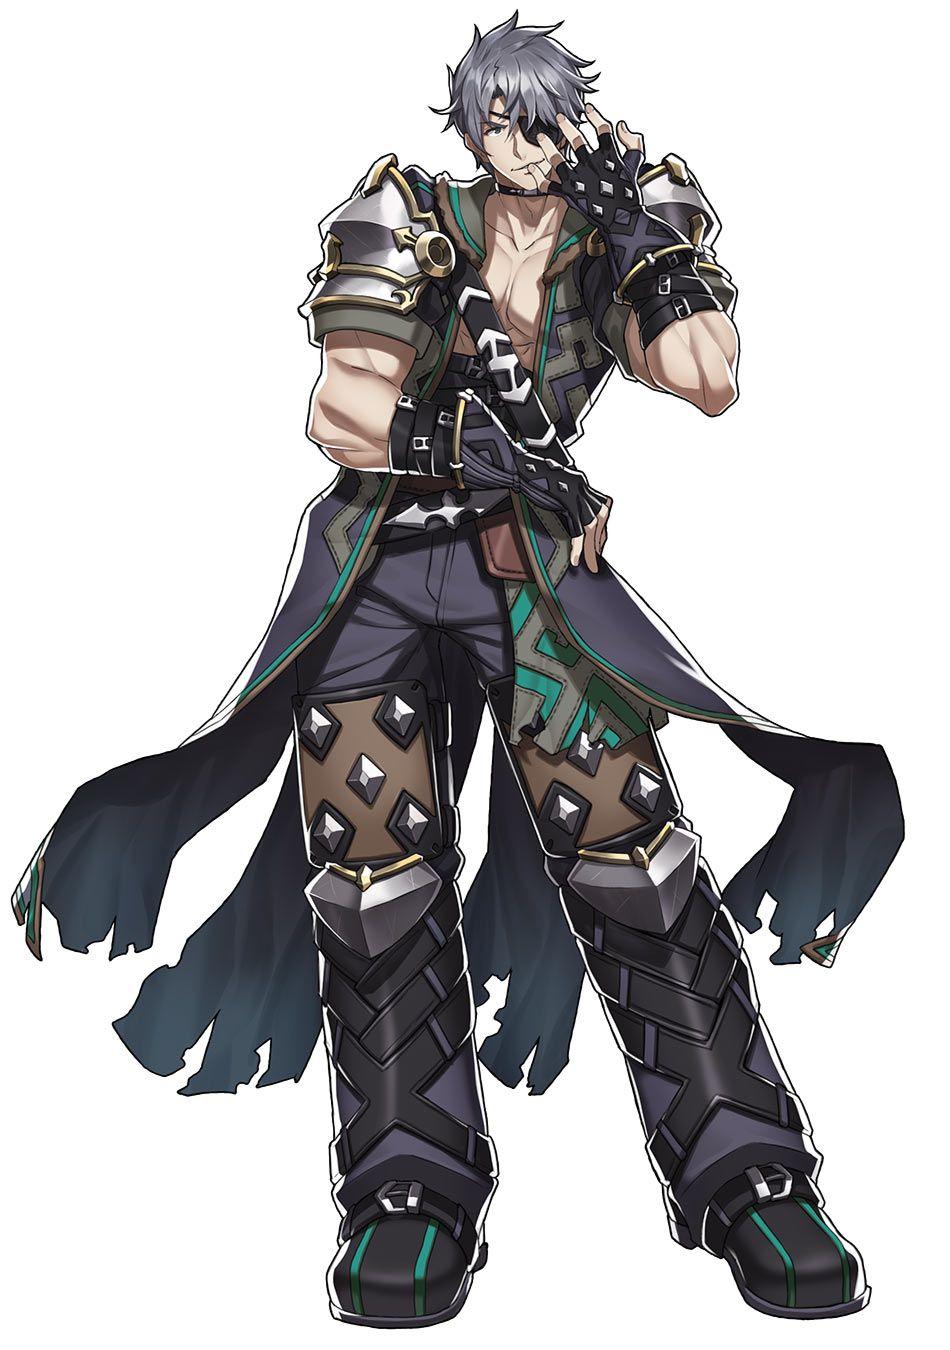 Zeke character art from Xenoblade Chronicles 2 art